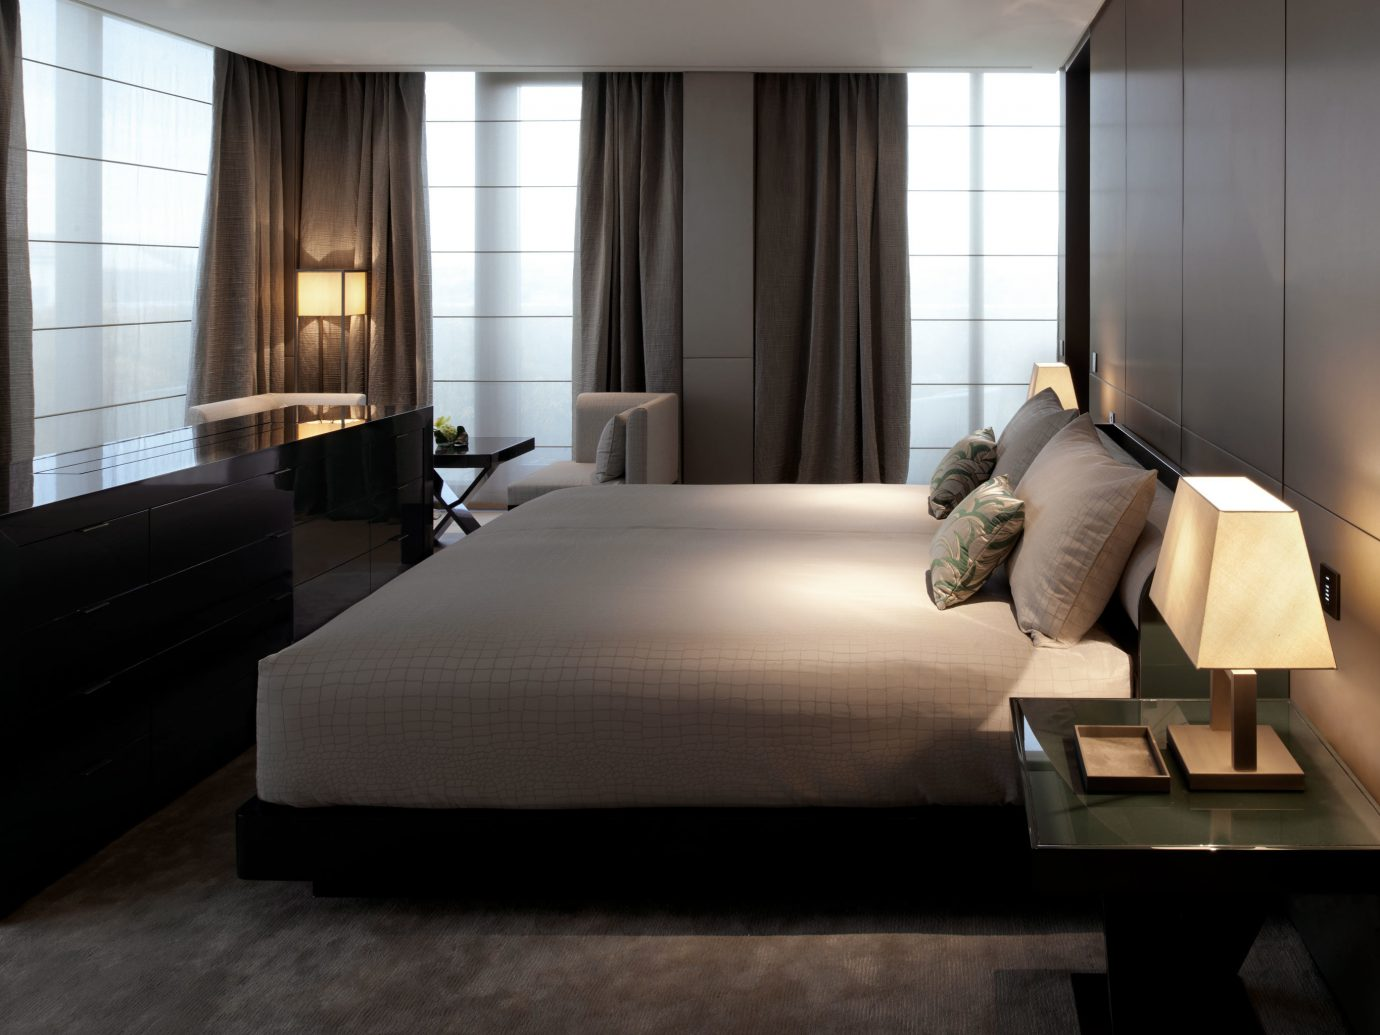 Bedroom Hotels Italy Luxury Milan Modern Suite indoor floor window room wall sofa bed property living room hotel ceiling interior design furniture Design window covering